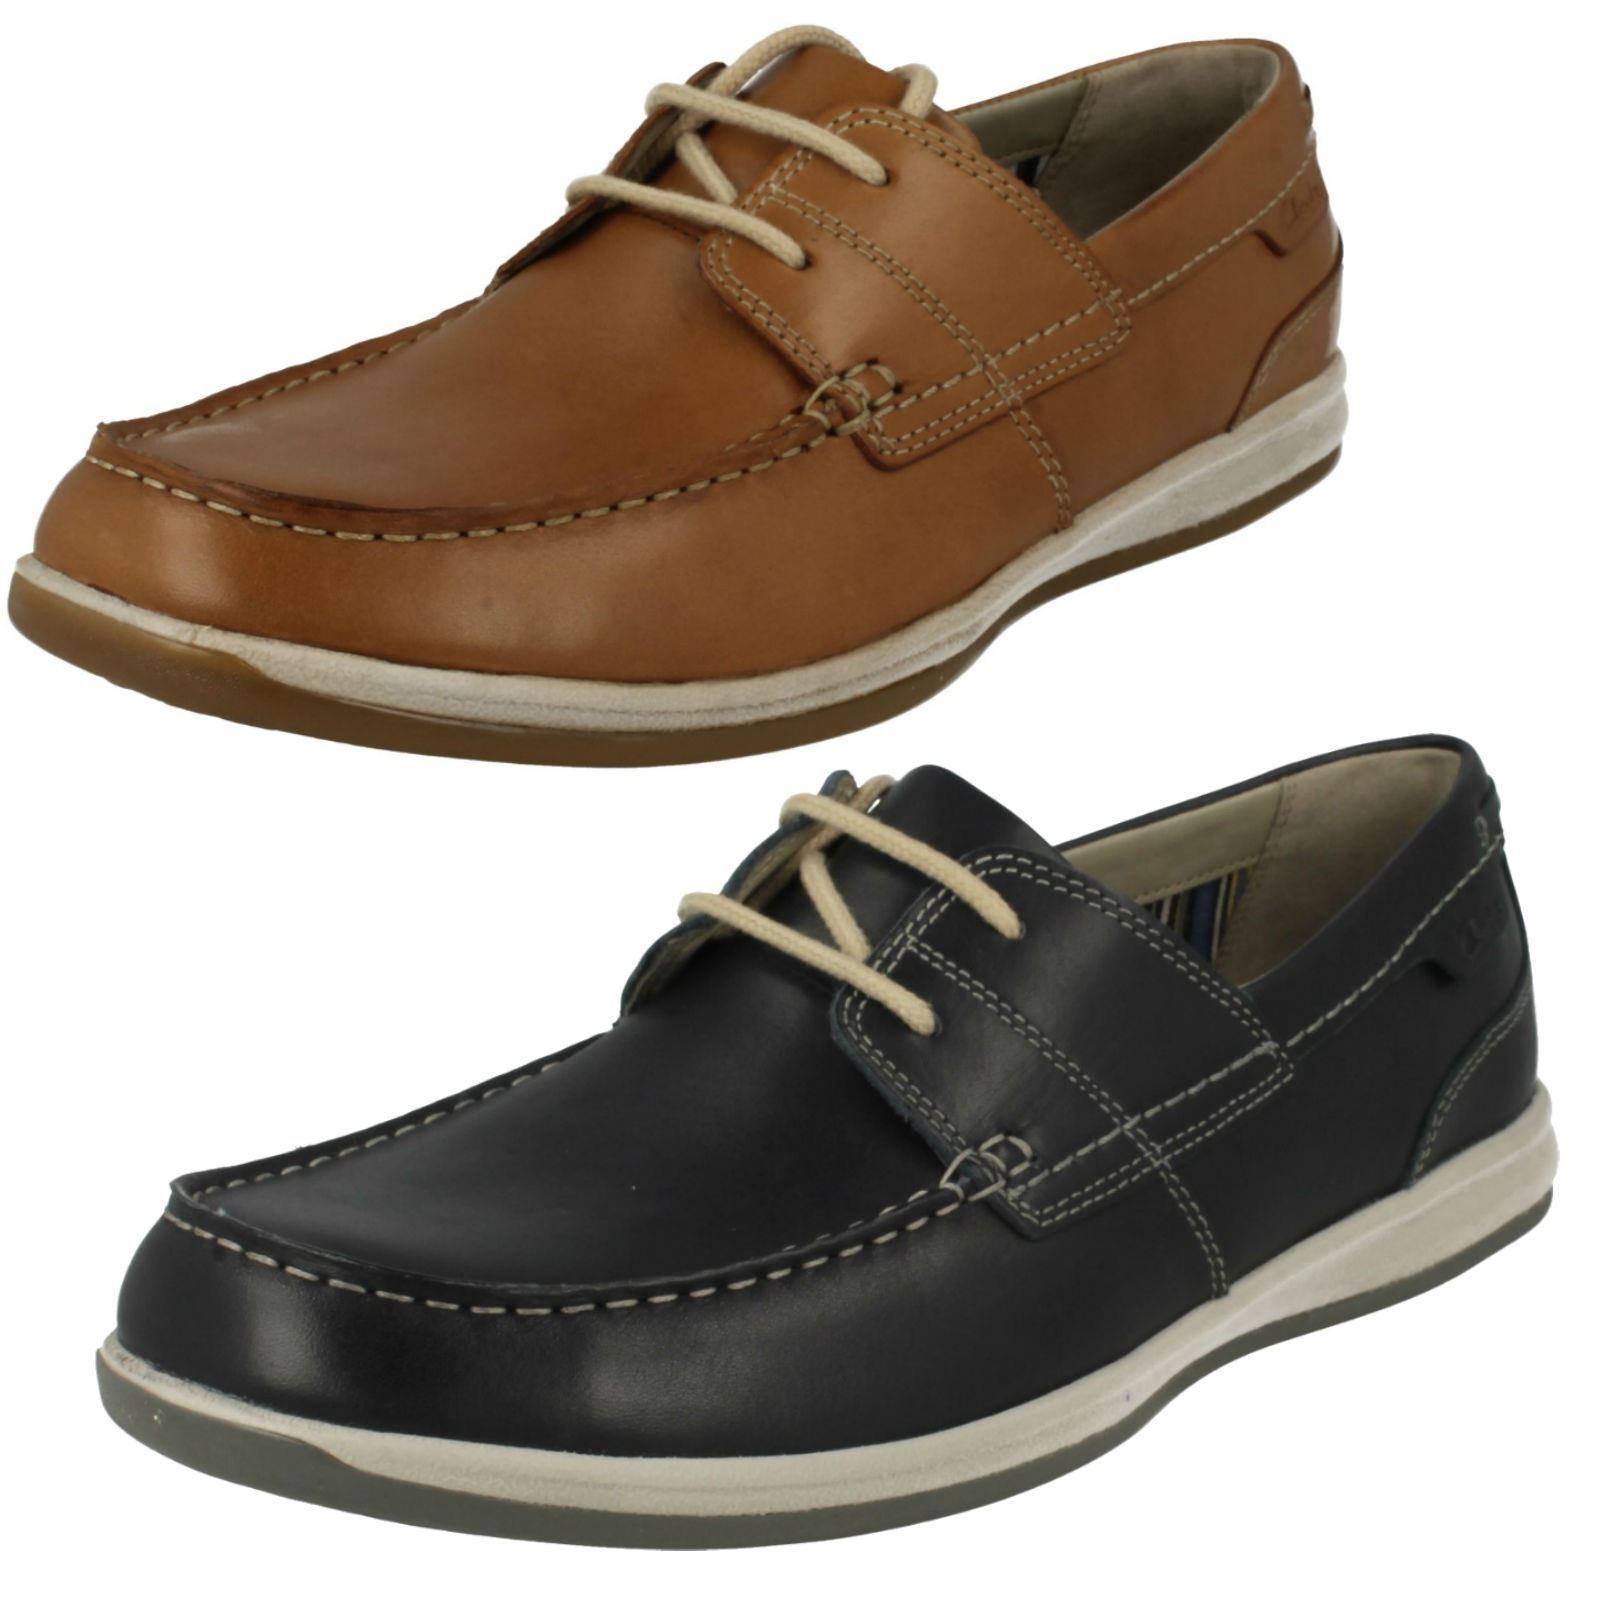 Herren Fallston Style Marineblau Leder Clarks Schnürbar Mokassin Schuhe von Clarks Leder a5d24d